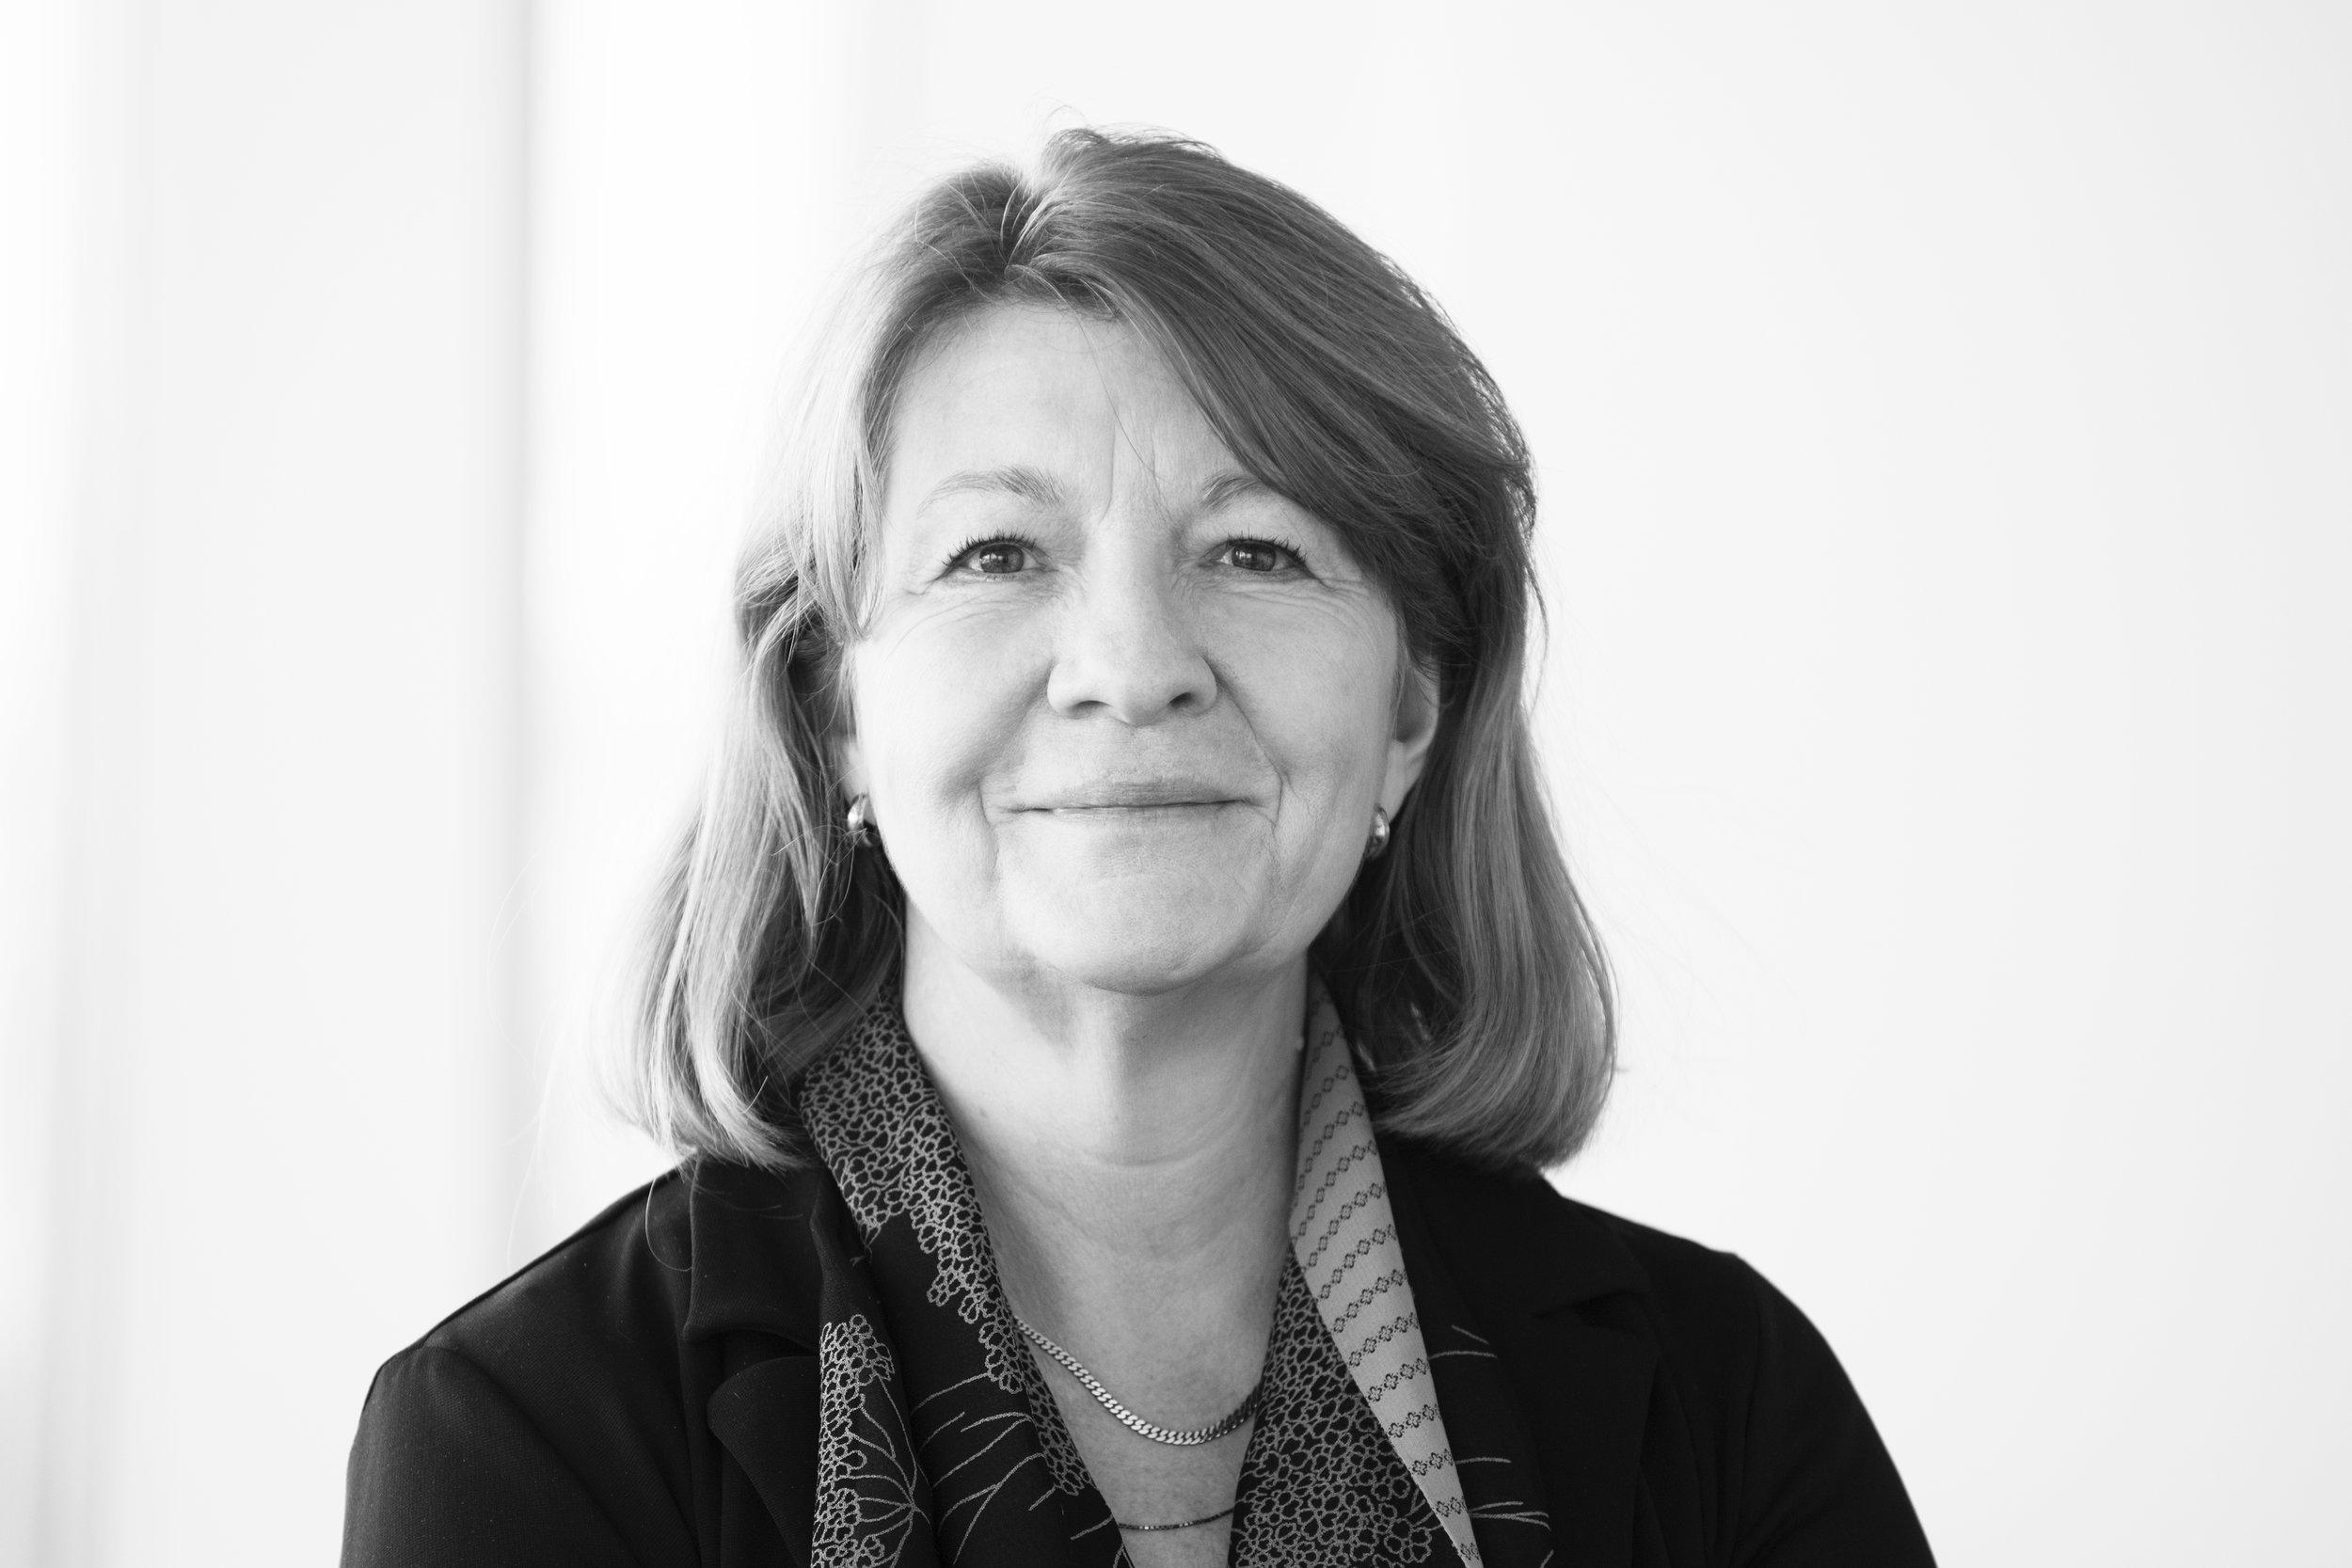 ANN JOHANSSON - Business AssistantExtensive experience in professional services. Previous roles at McKinsey, White & Case and Odgers Berndtson. Read more →+46 (0)70 493 64 54ann.johansson@nordicinterim.com